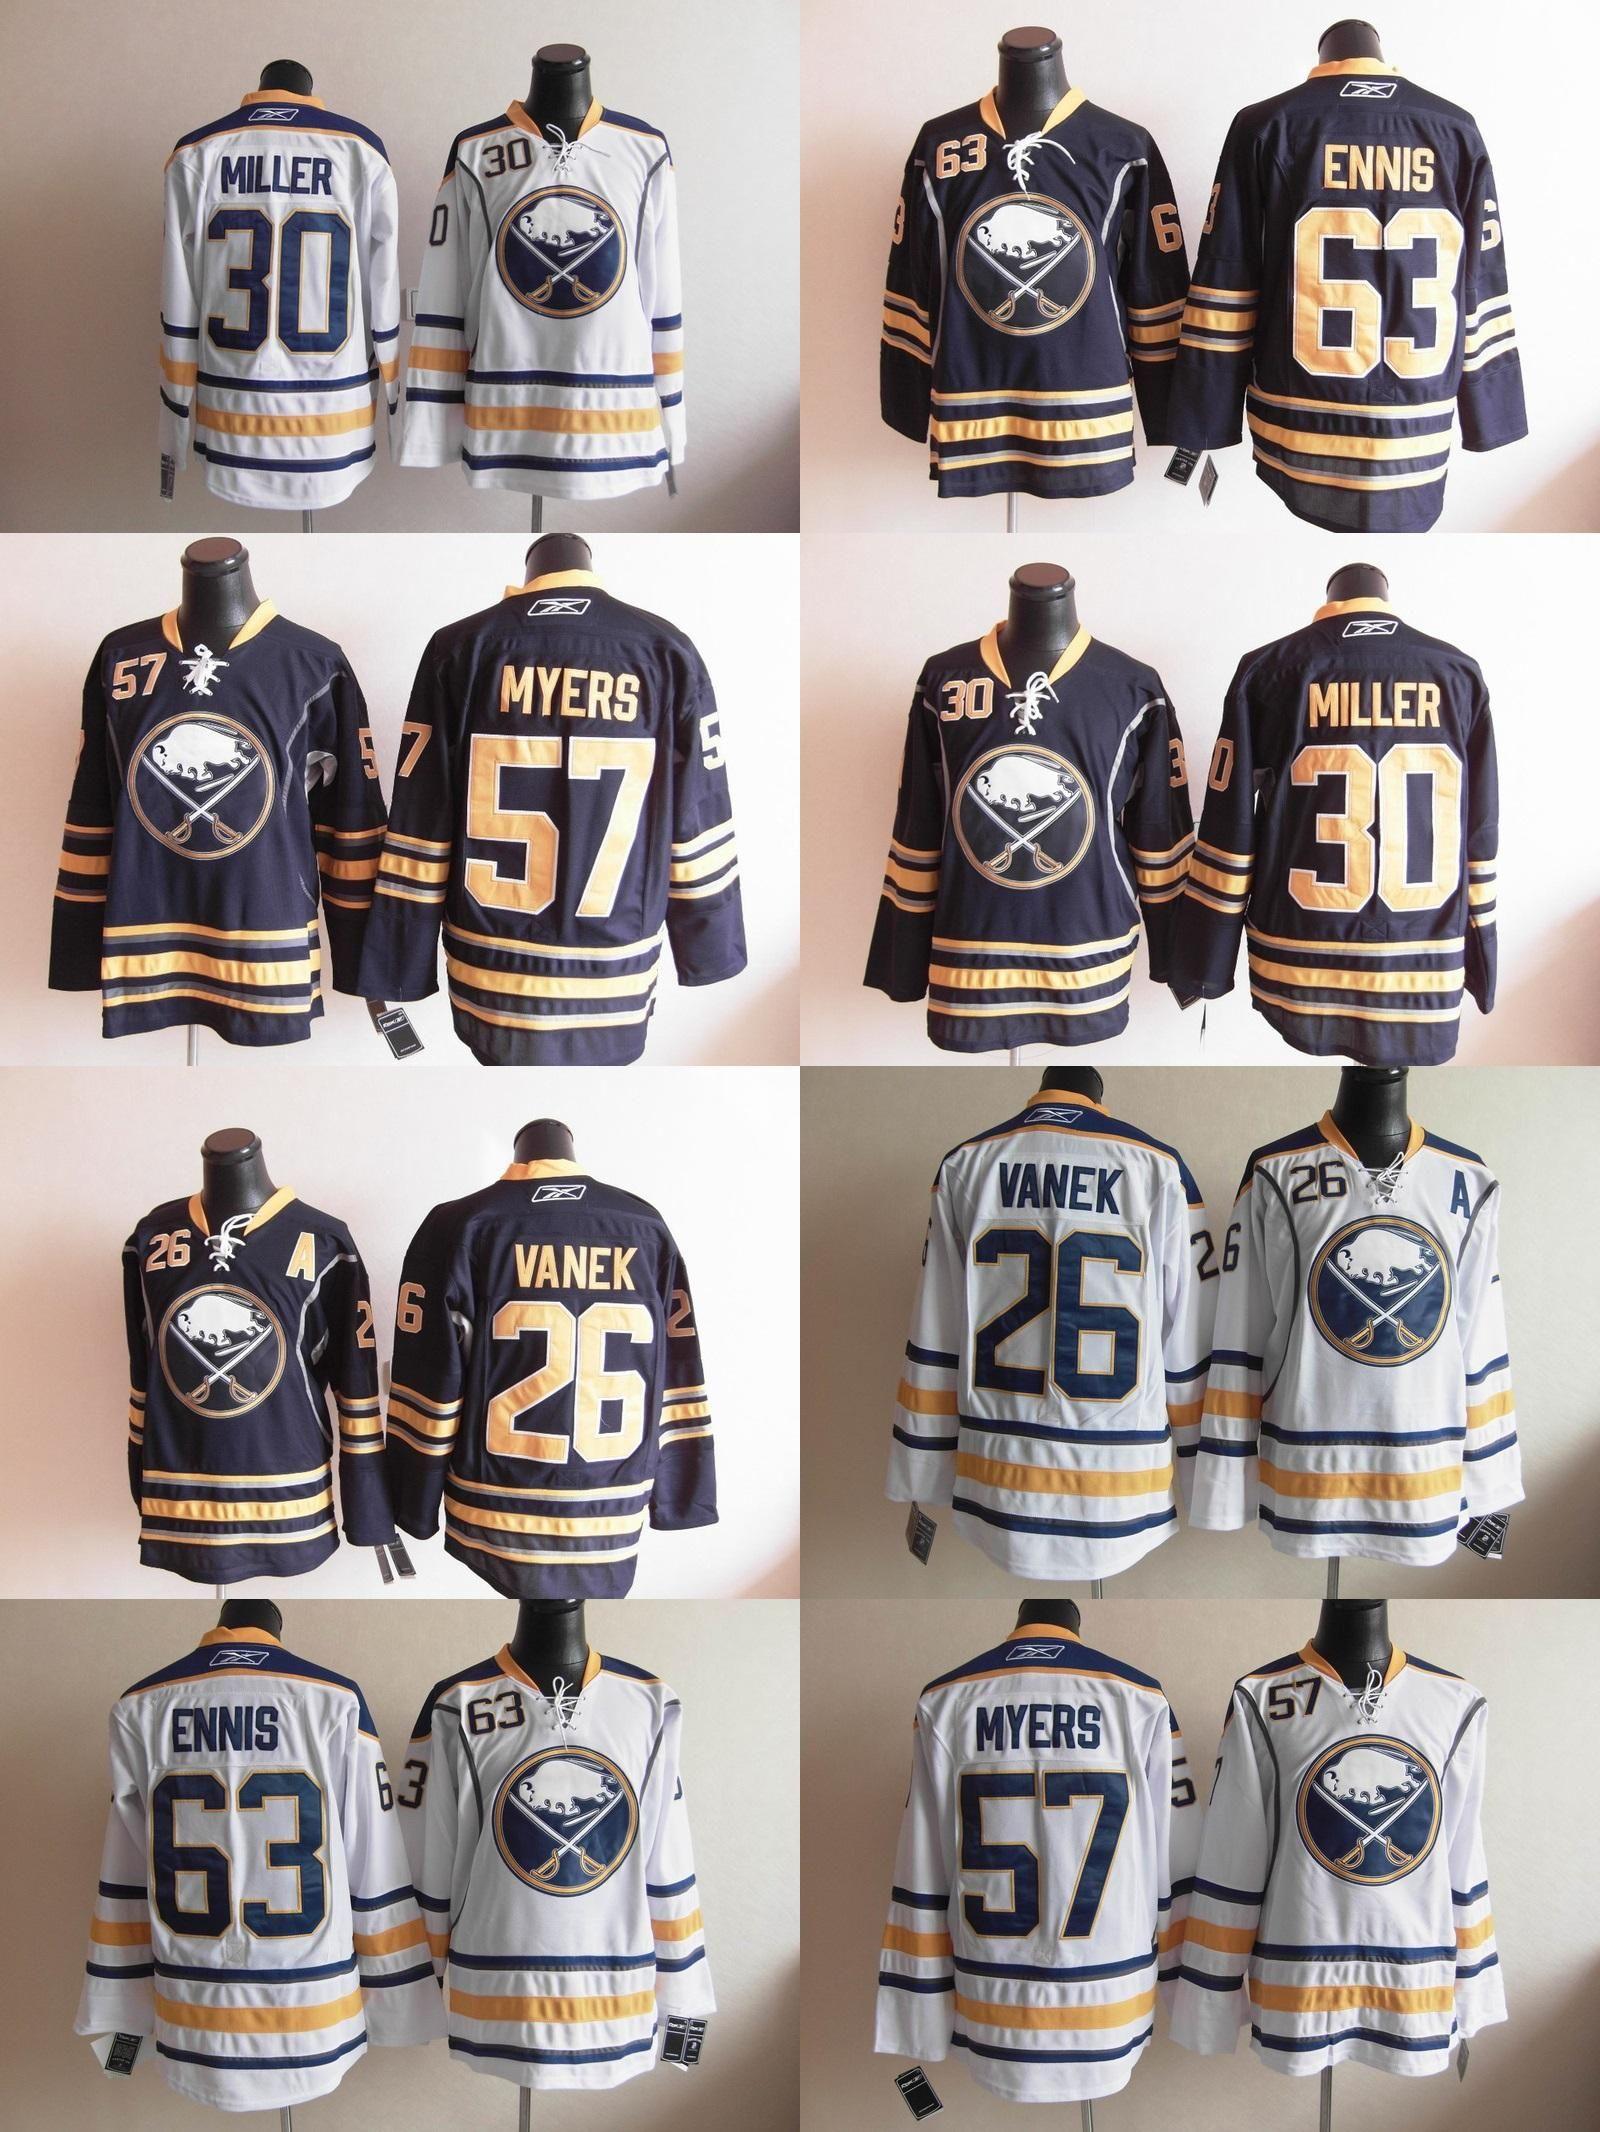 48b601610 2019 2016 Wholesale Buffalo Sabres  63 Ennis  57 Myers  30 Miller  26 Vanek  Dark Blue Regular Home Jersey White Regular Away Ice Hockey Jerseys From  Probowl ...